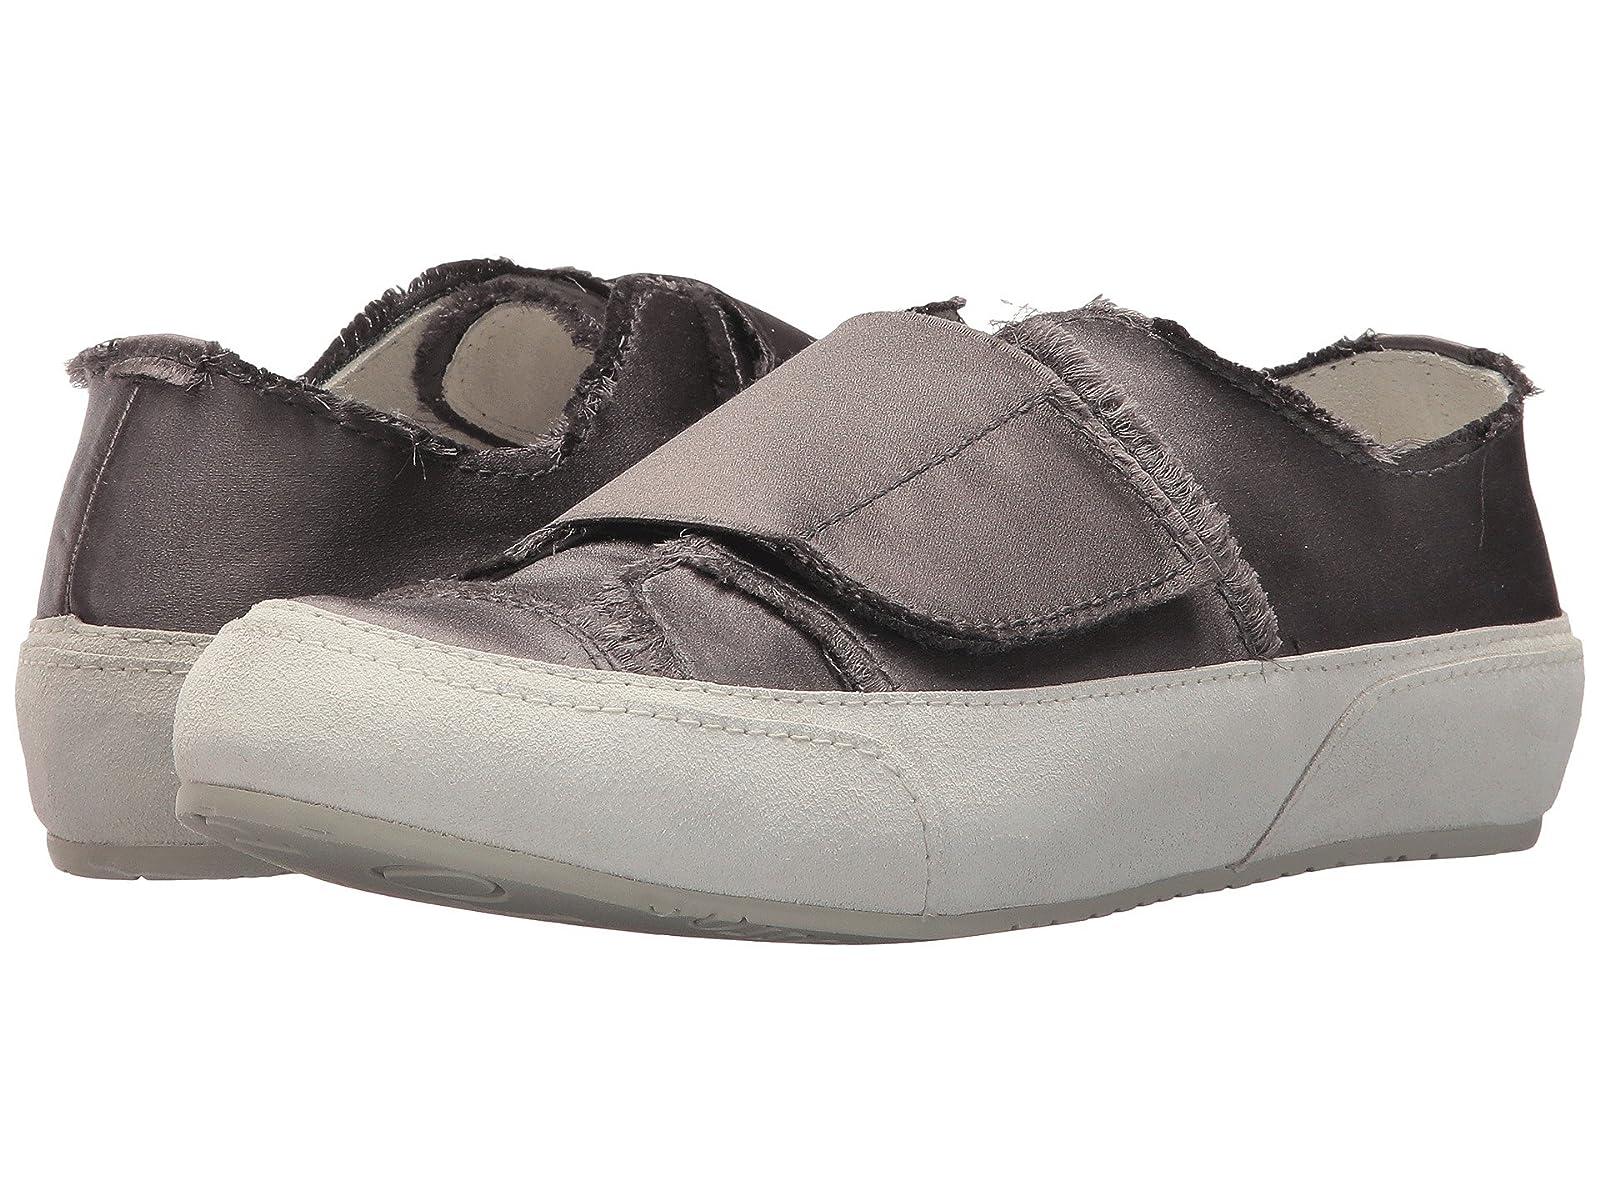 Pedro Garcia Palmira 644Cheap and distinctive eye-catching shoes